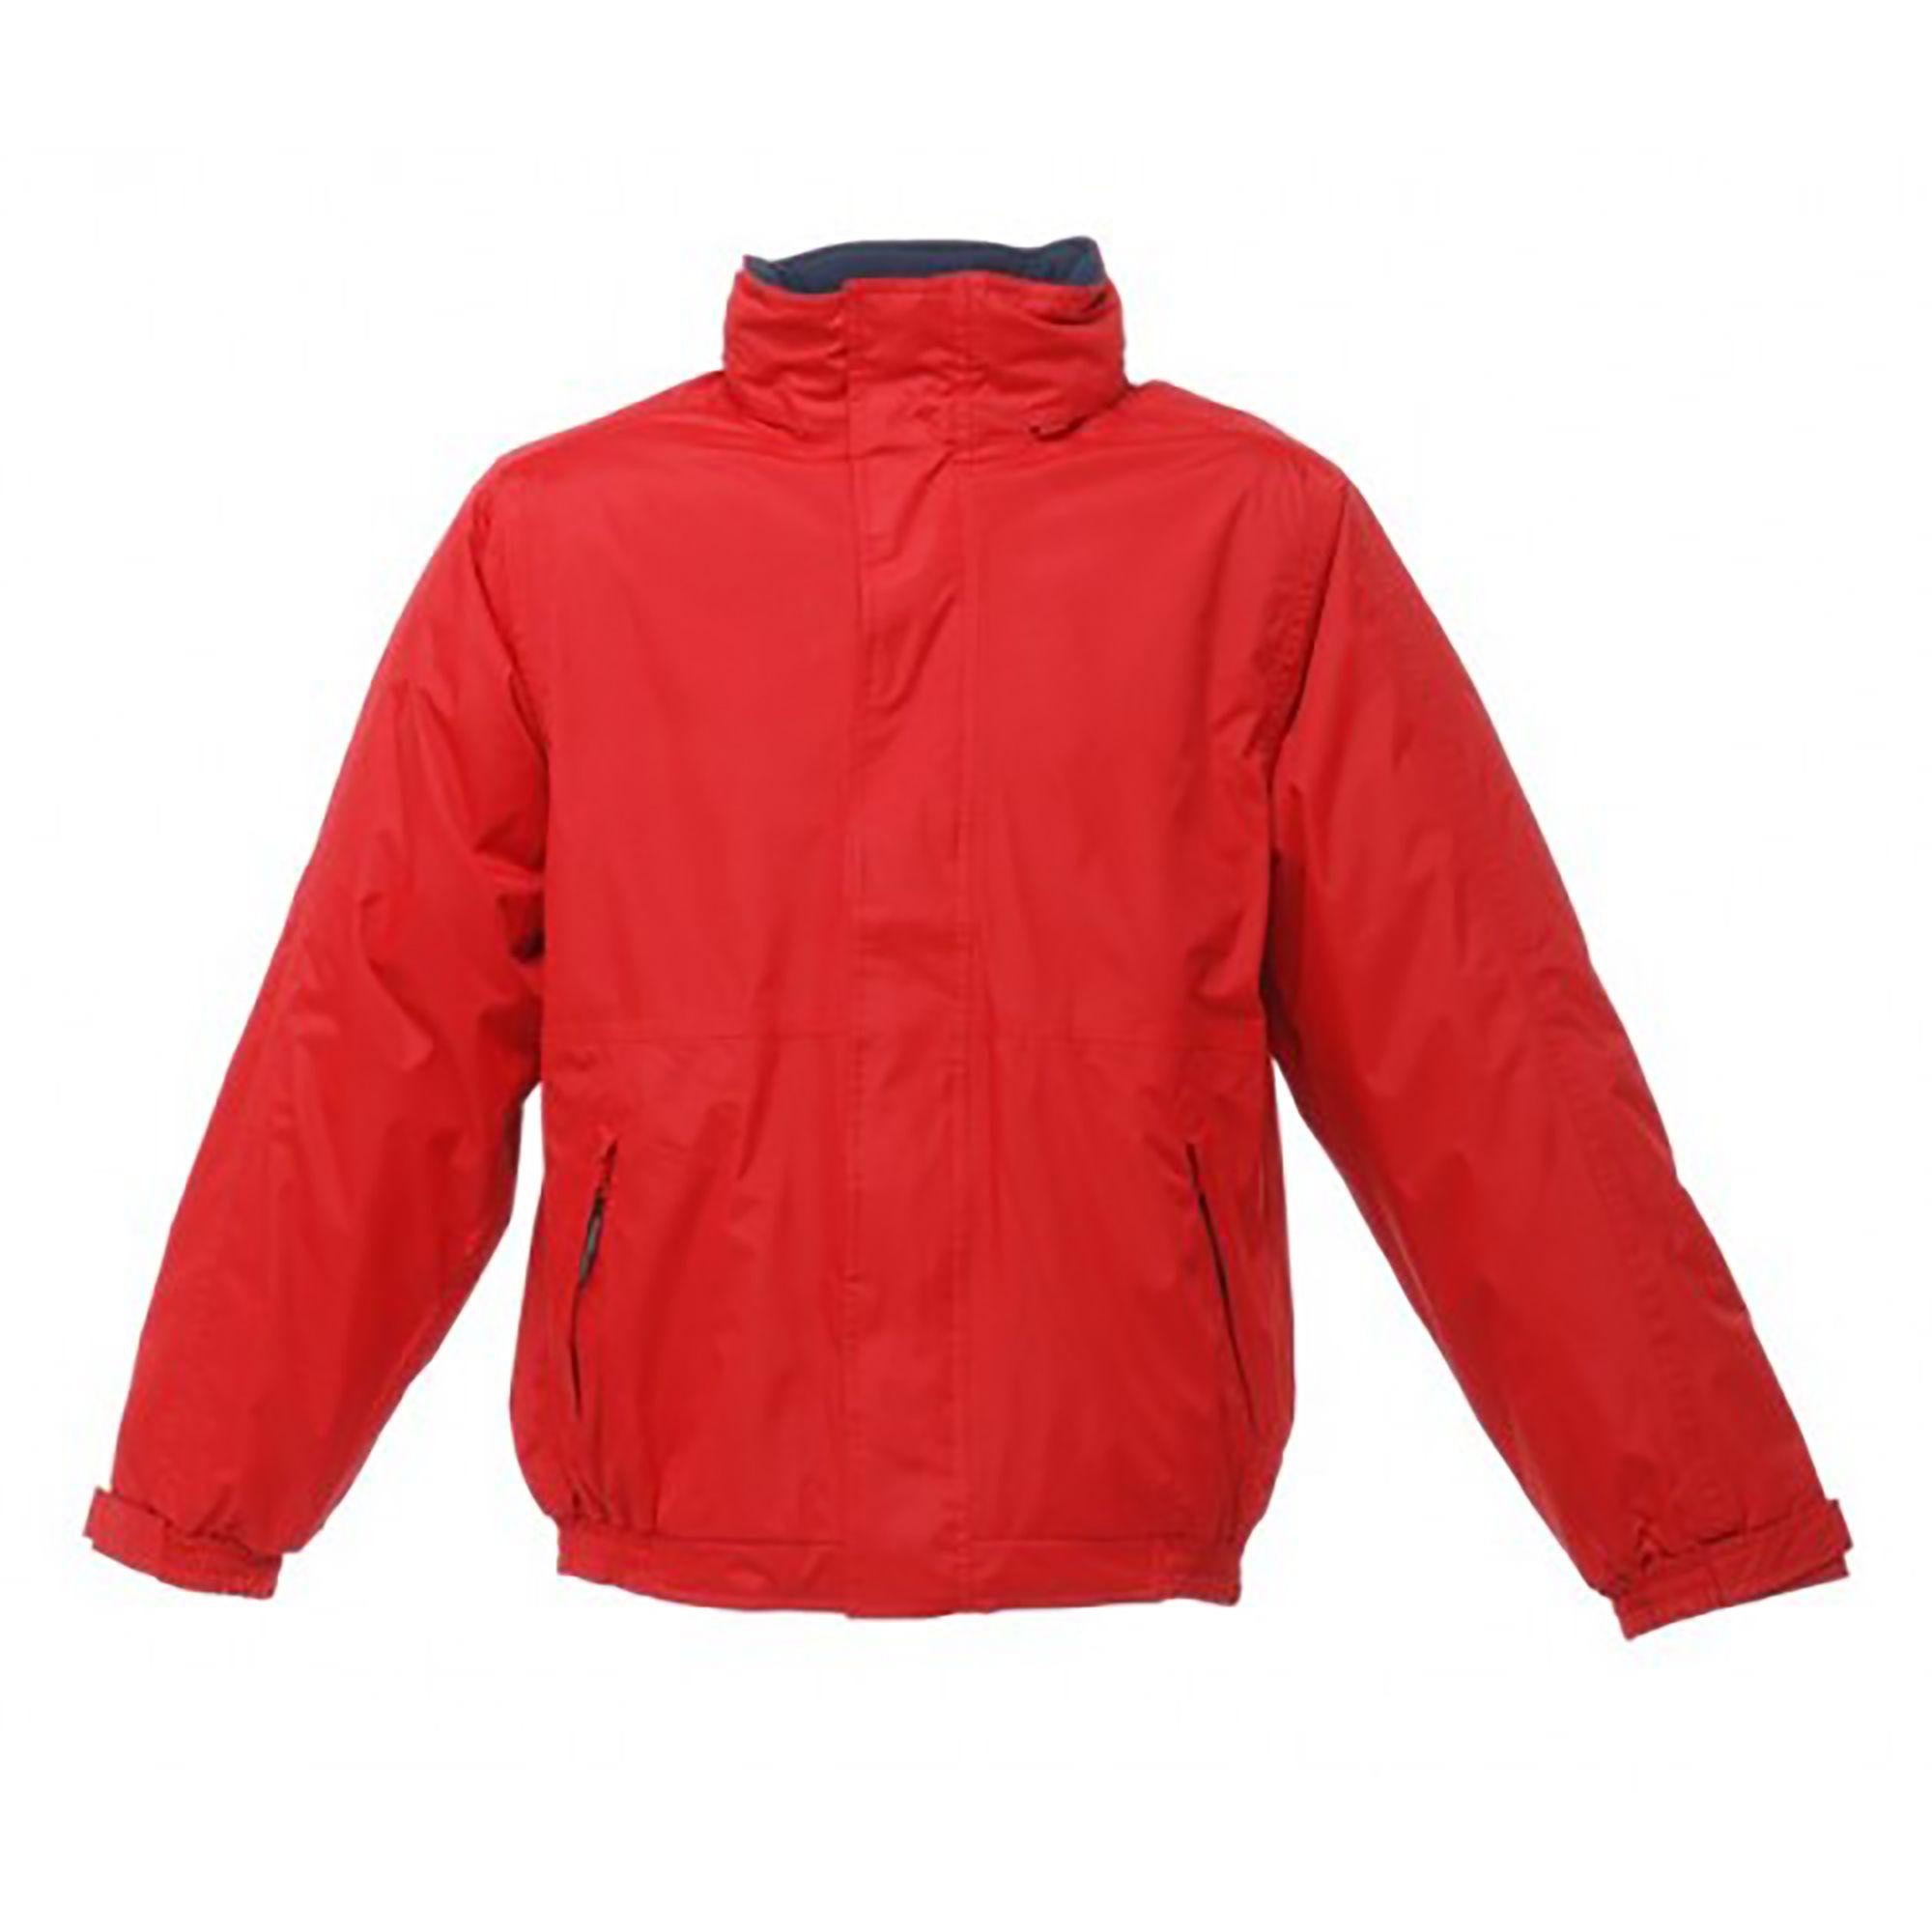 Regatta Dover Waterproof Windproof Jacket (Thermo-Guard Insulation)